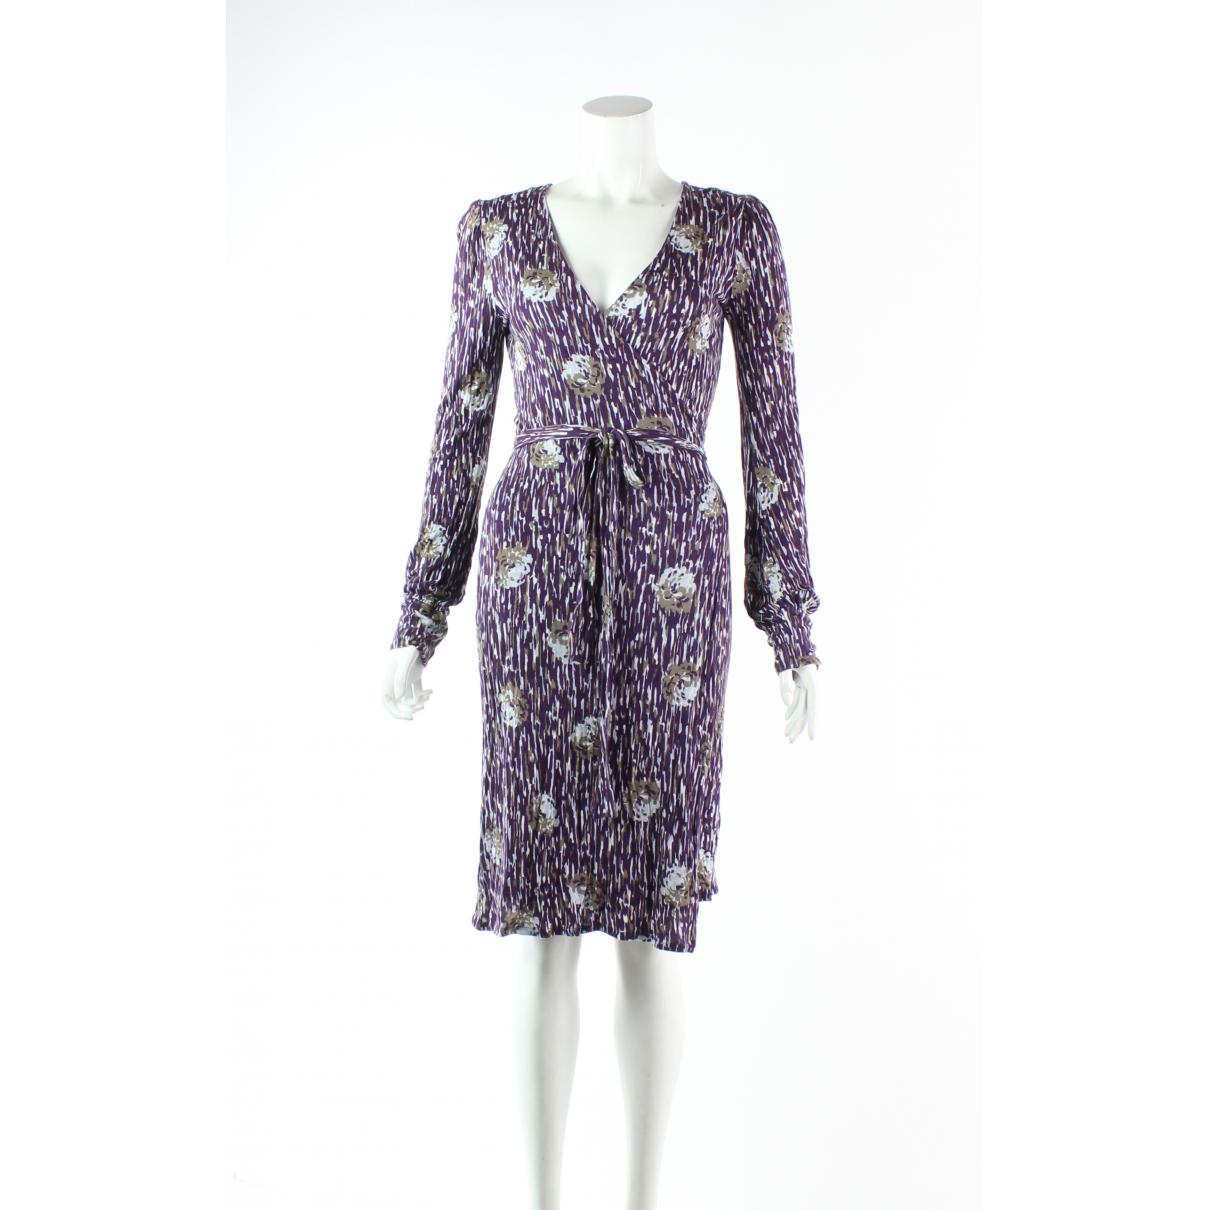 M Missoni N Purple dress for Women 8 US